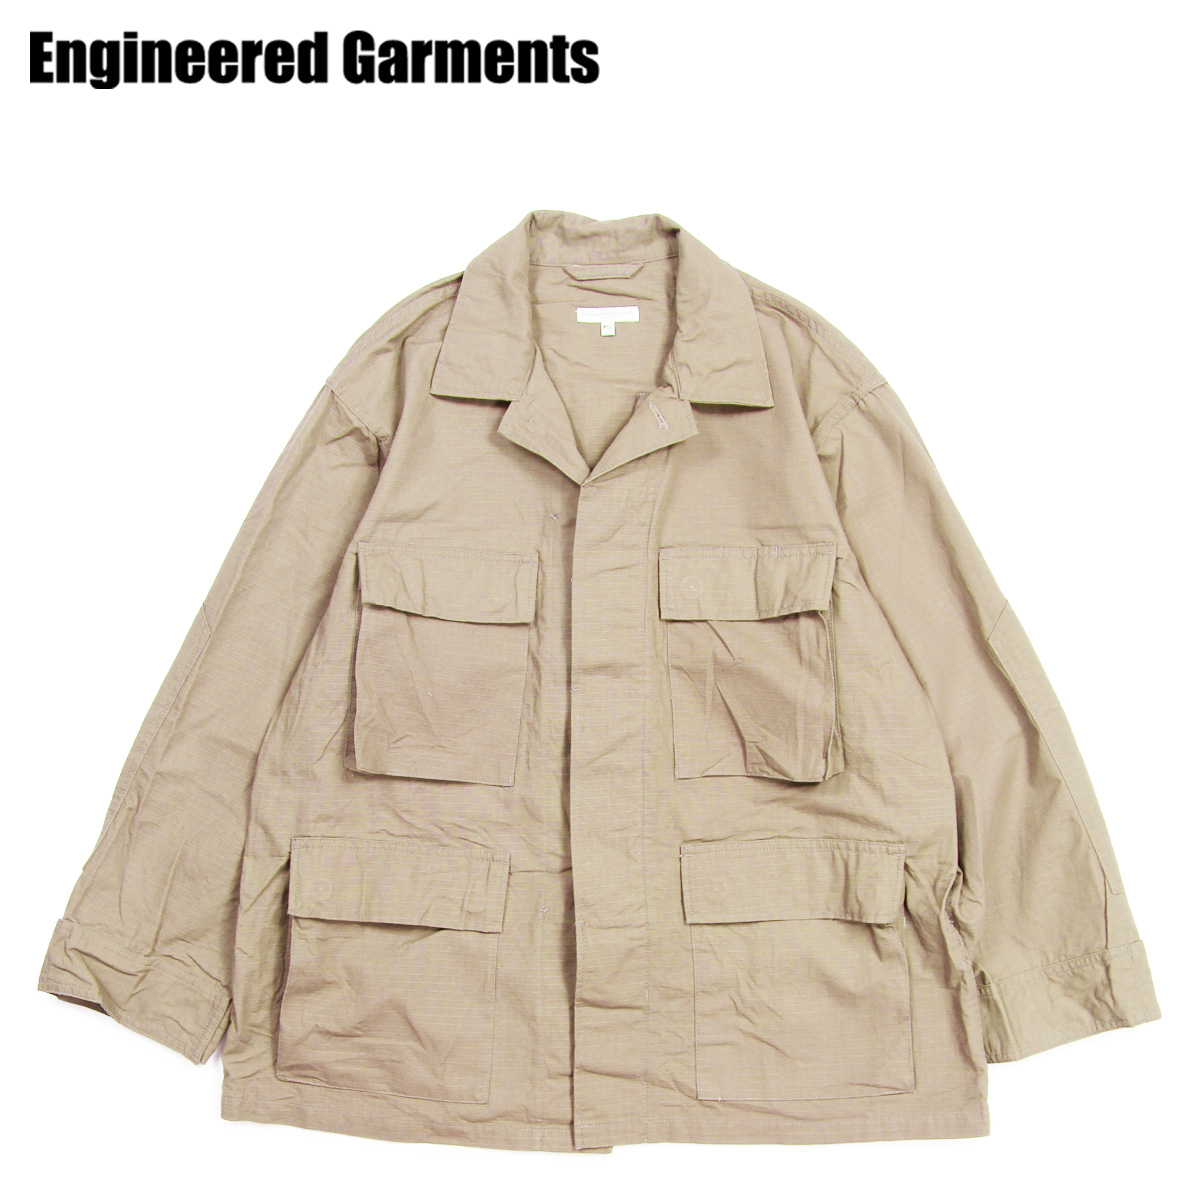 ENGINEERED GARMENTS BDU JACKET エンジニアドガーメンツ ジャケット ミリタリージャケット メンズ カーキ 19SD002